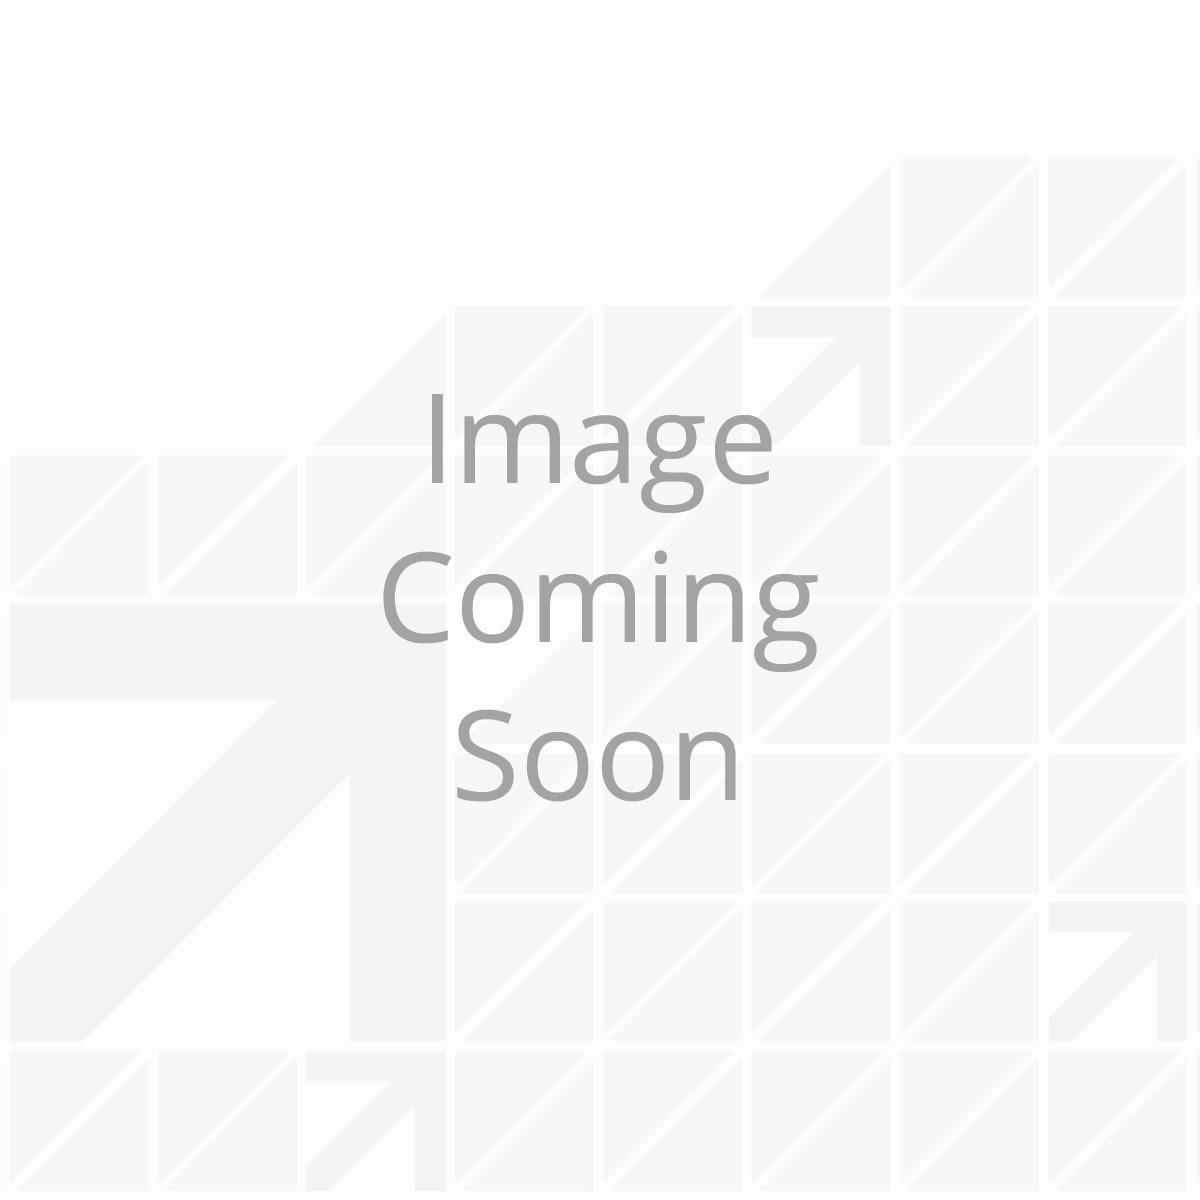 Pile Seal; .490 W X 1.500 H; Black Trilobal Yarn